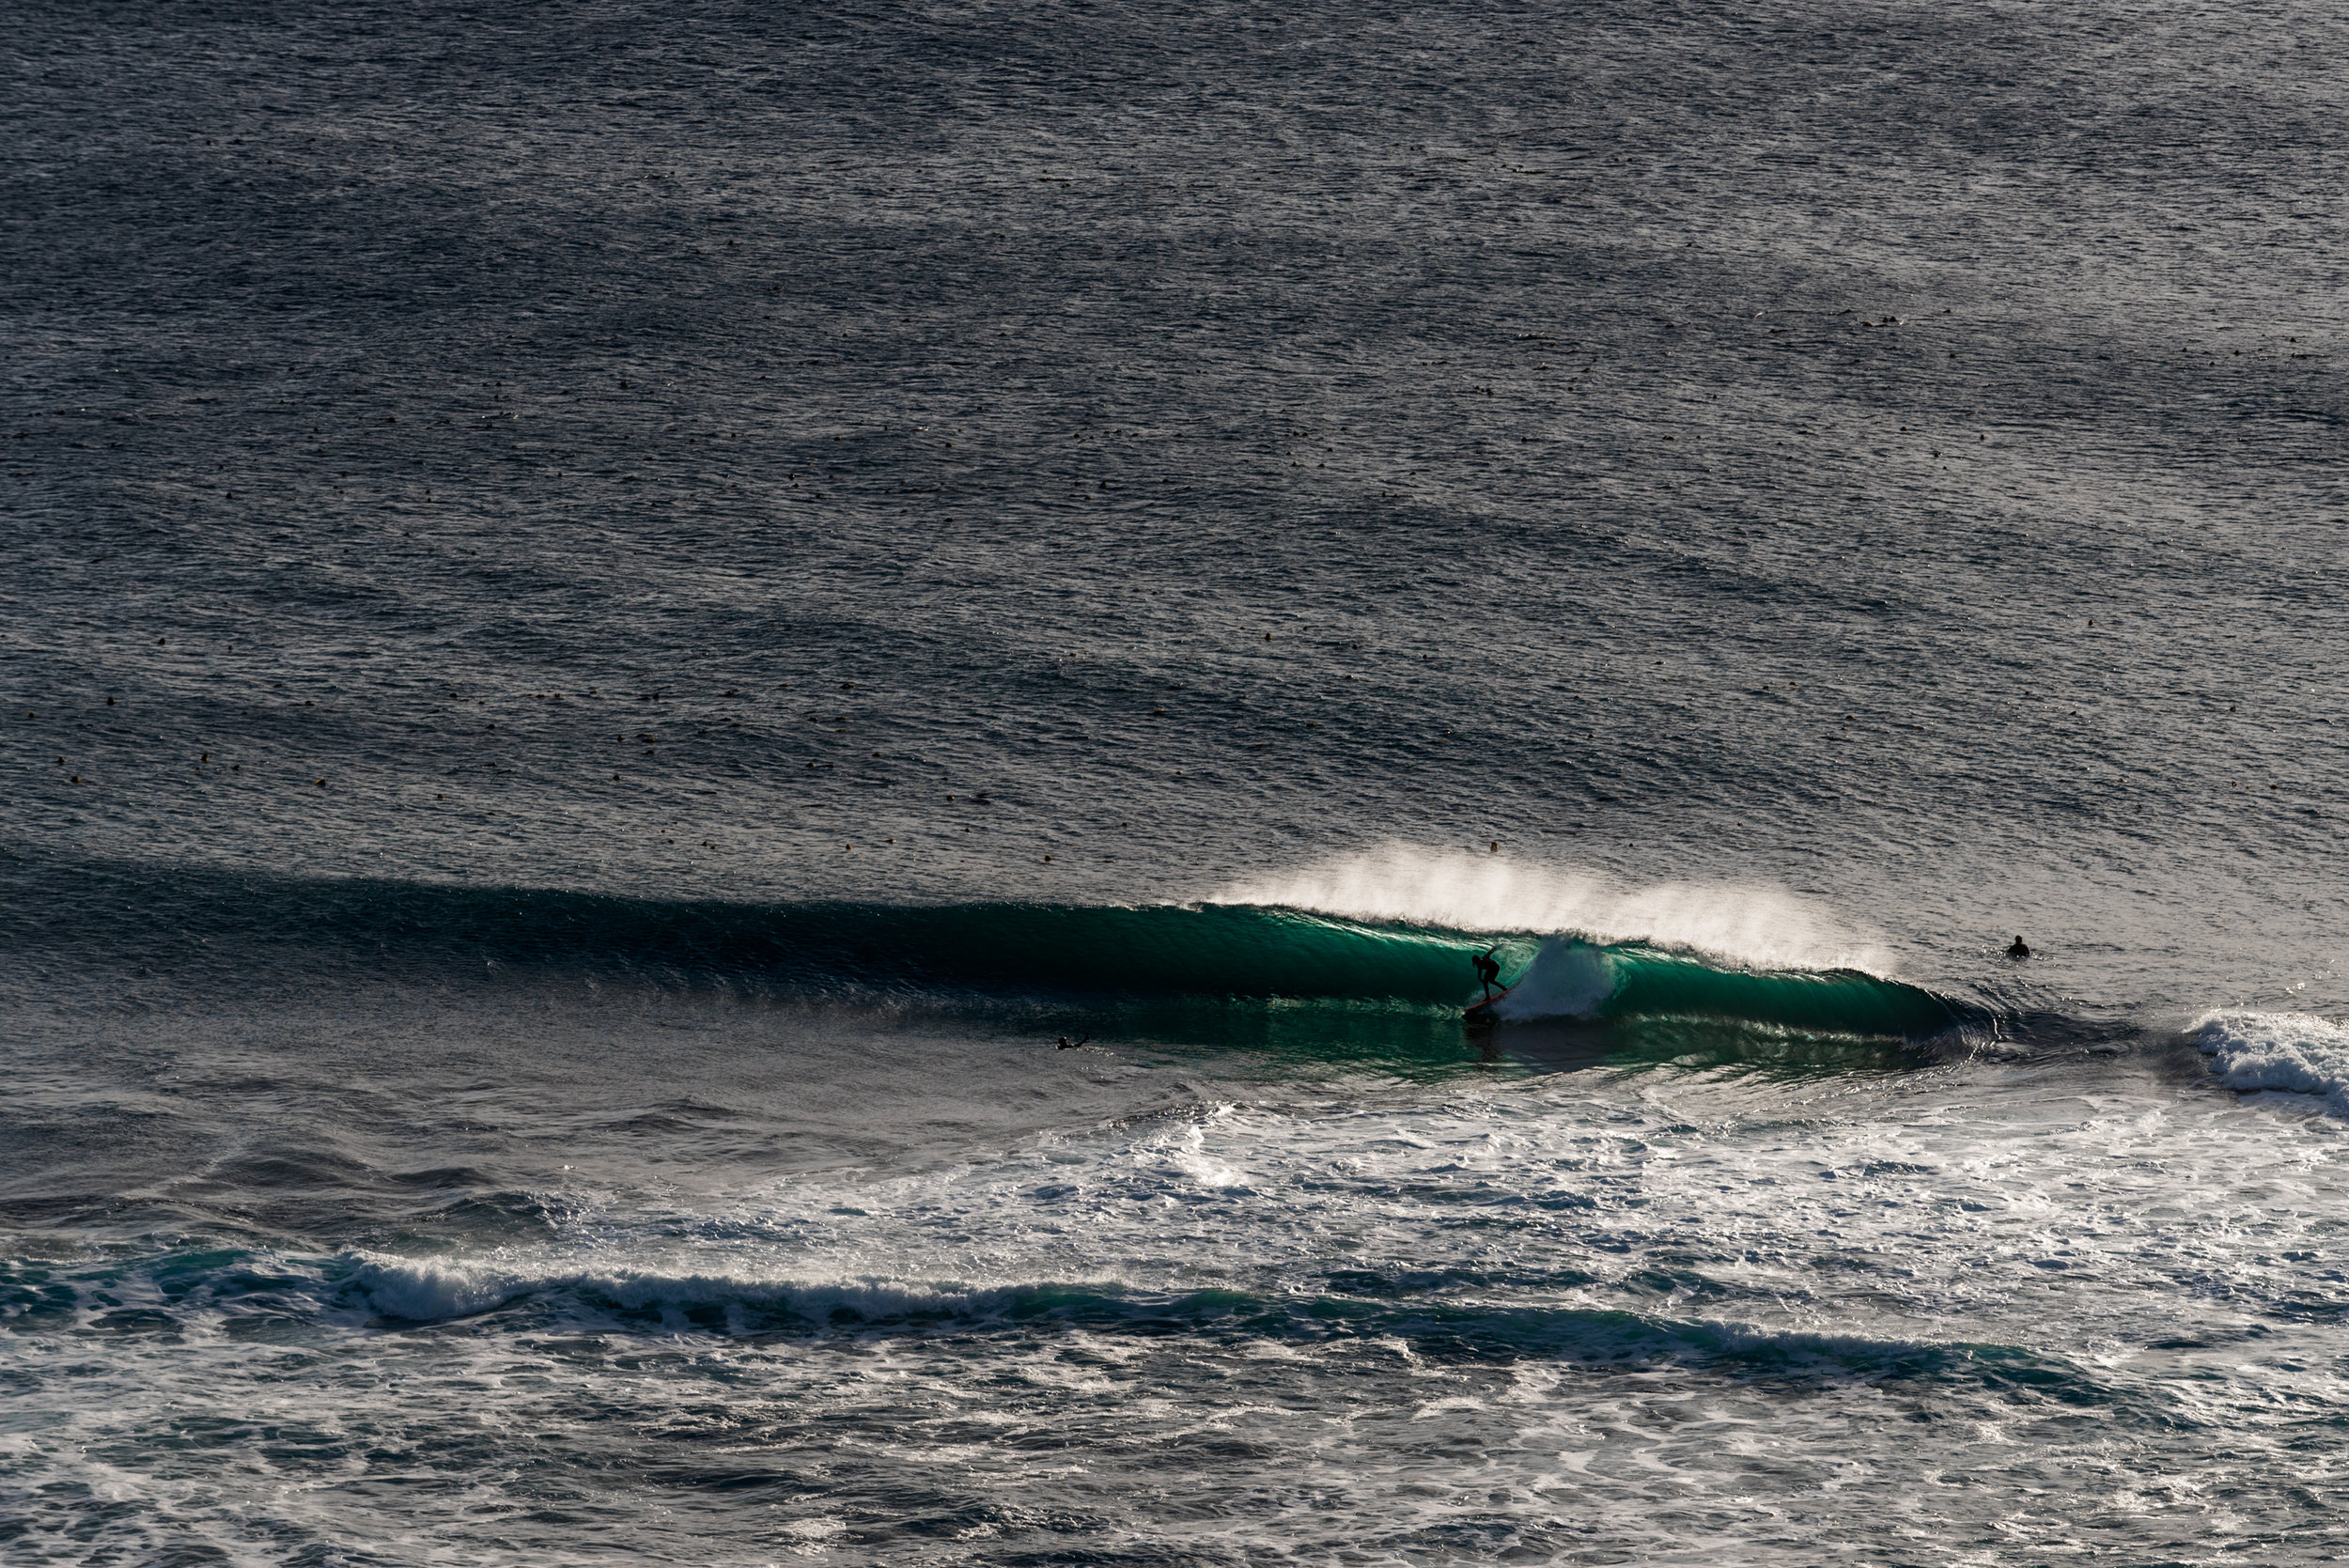 AleutianIslands-ChrisBrinleeJr-NOV16-D750-46.jpg